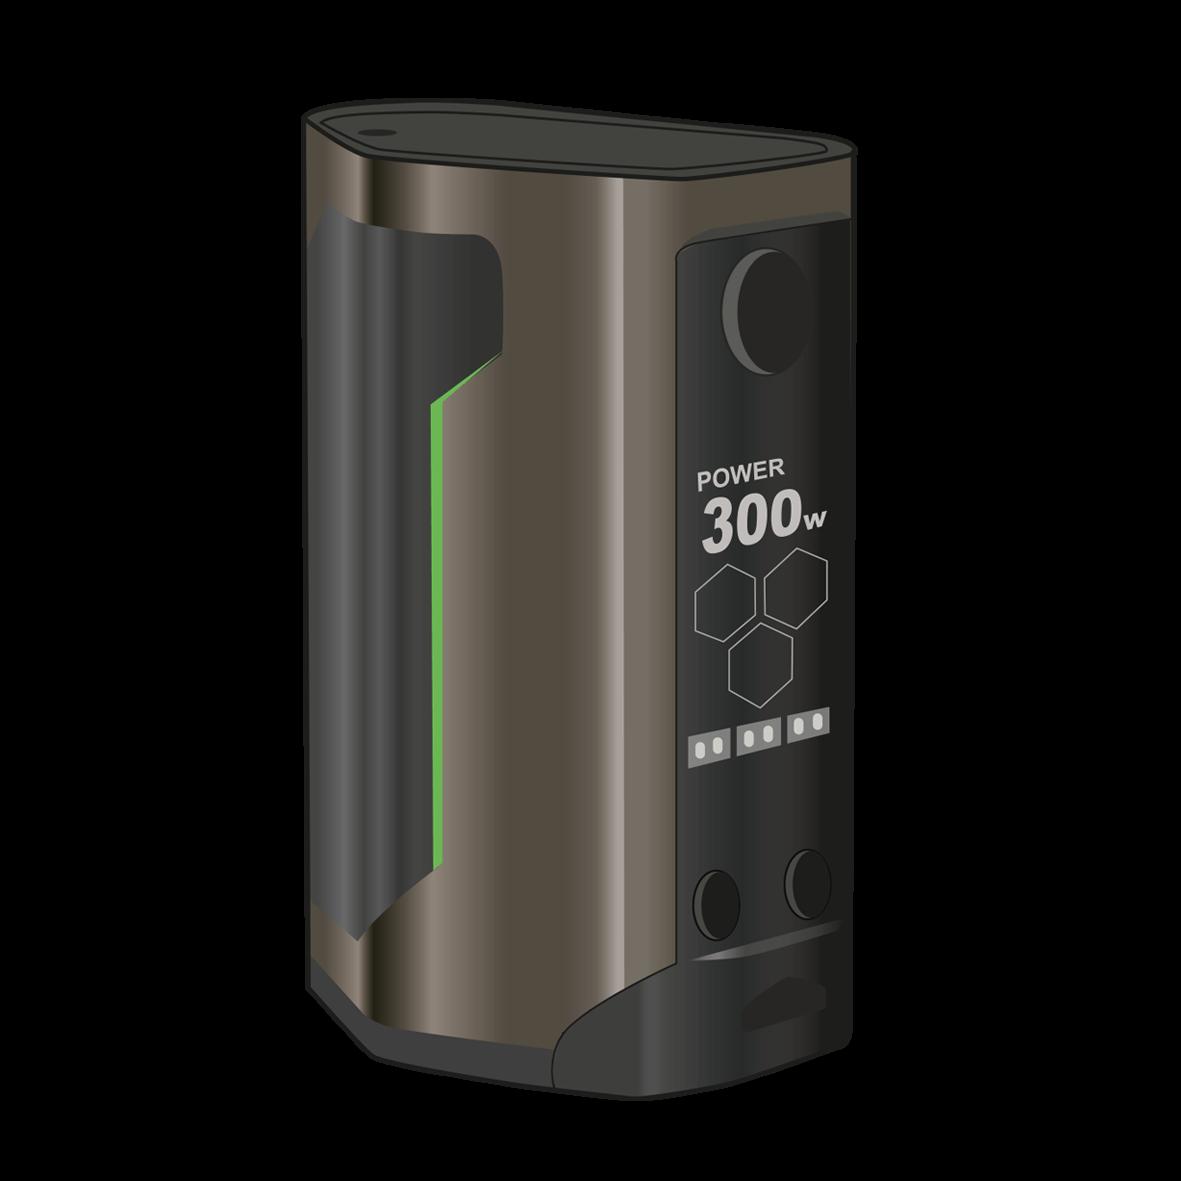 Mod 3 battery